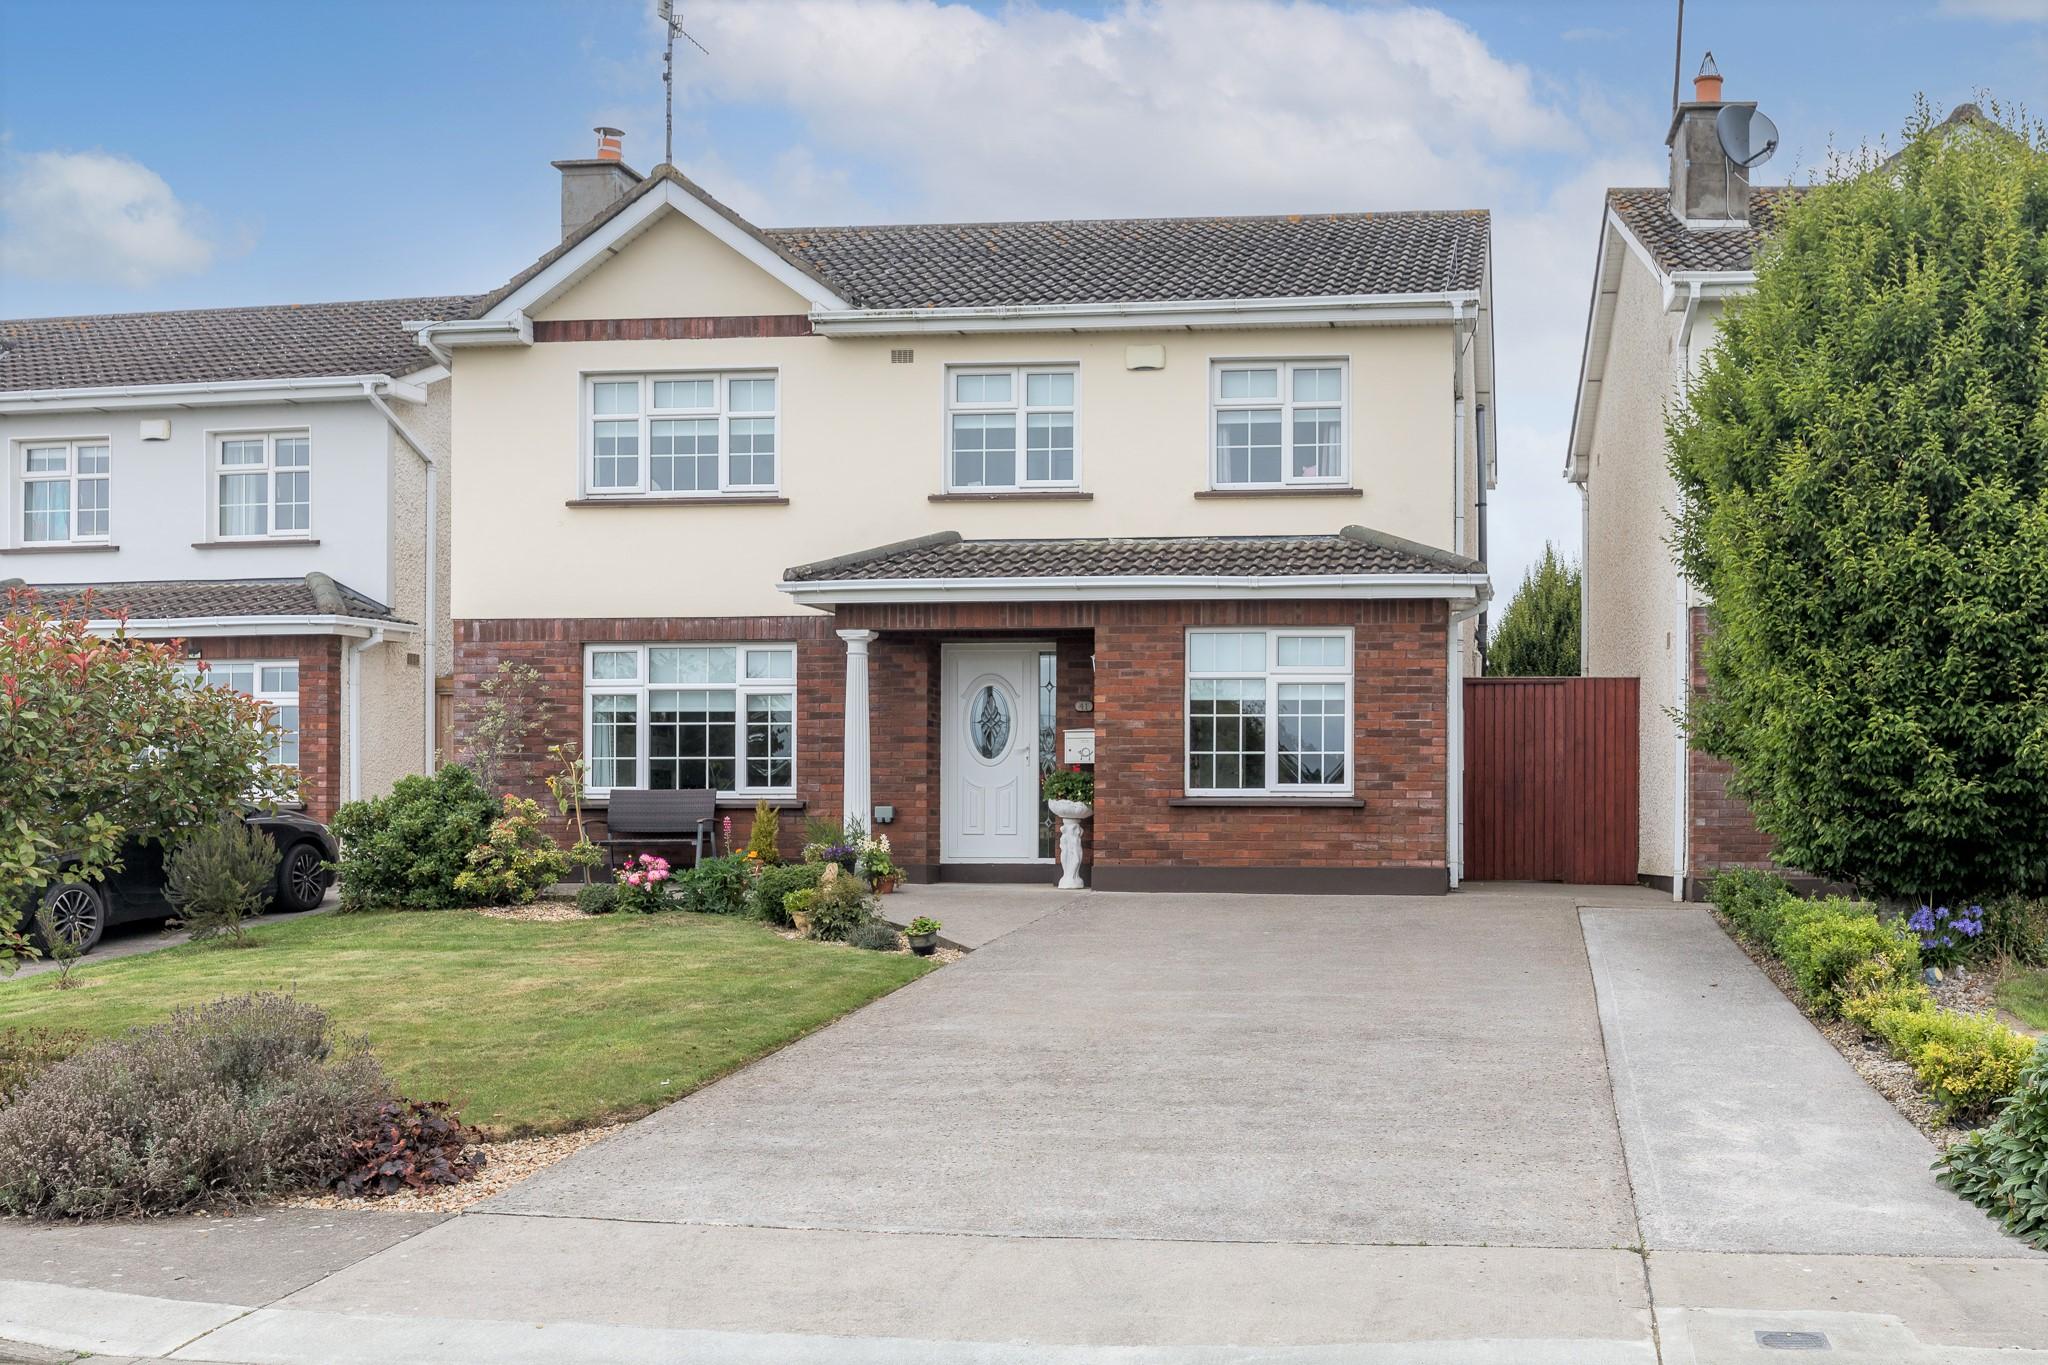 41 Five Oaks Village Dublin Road Drogheda Co Louth